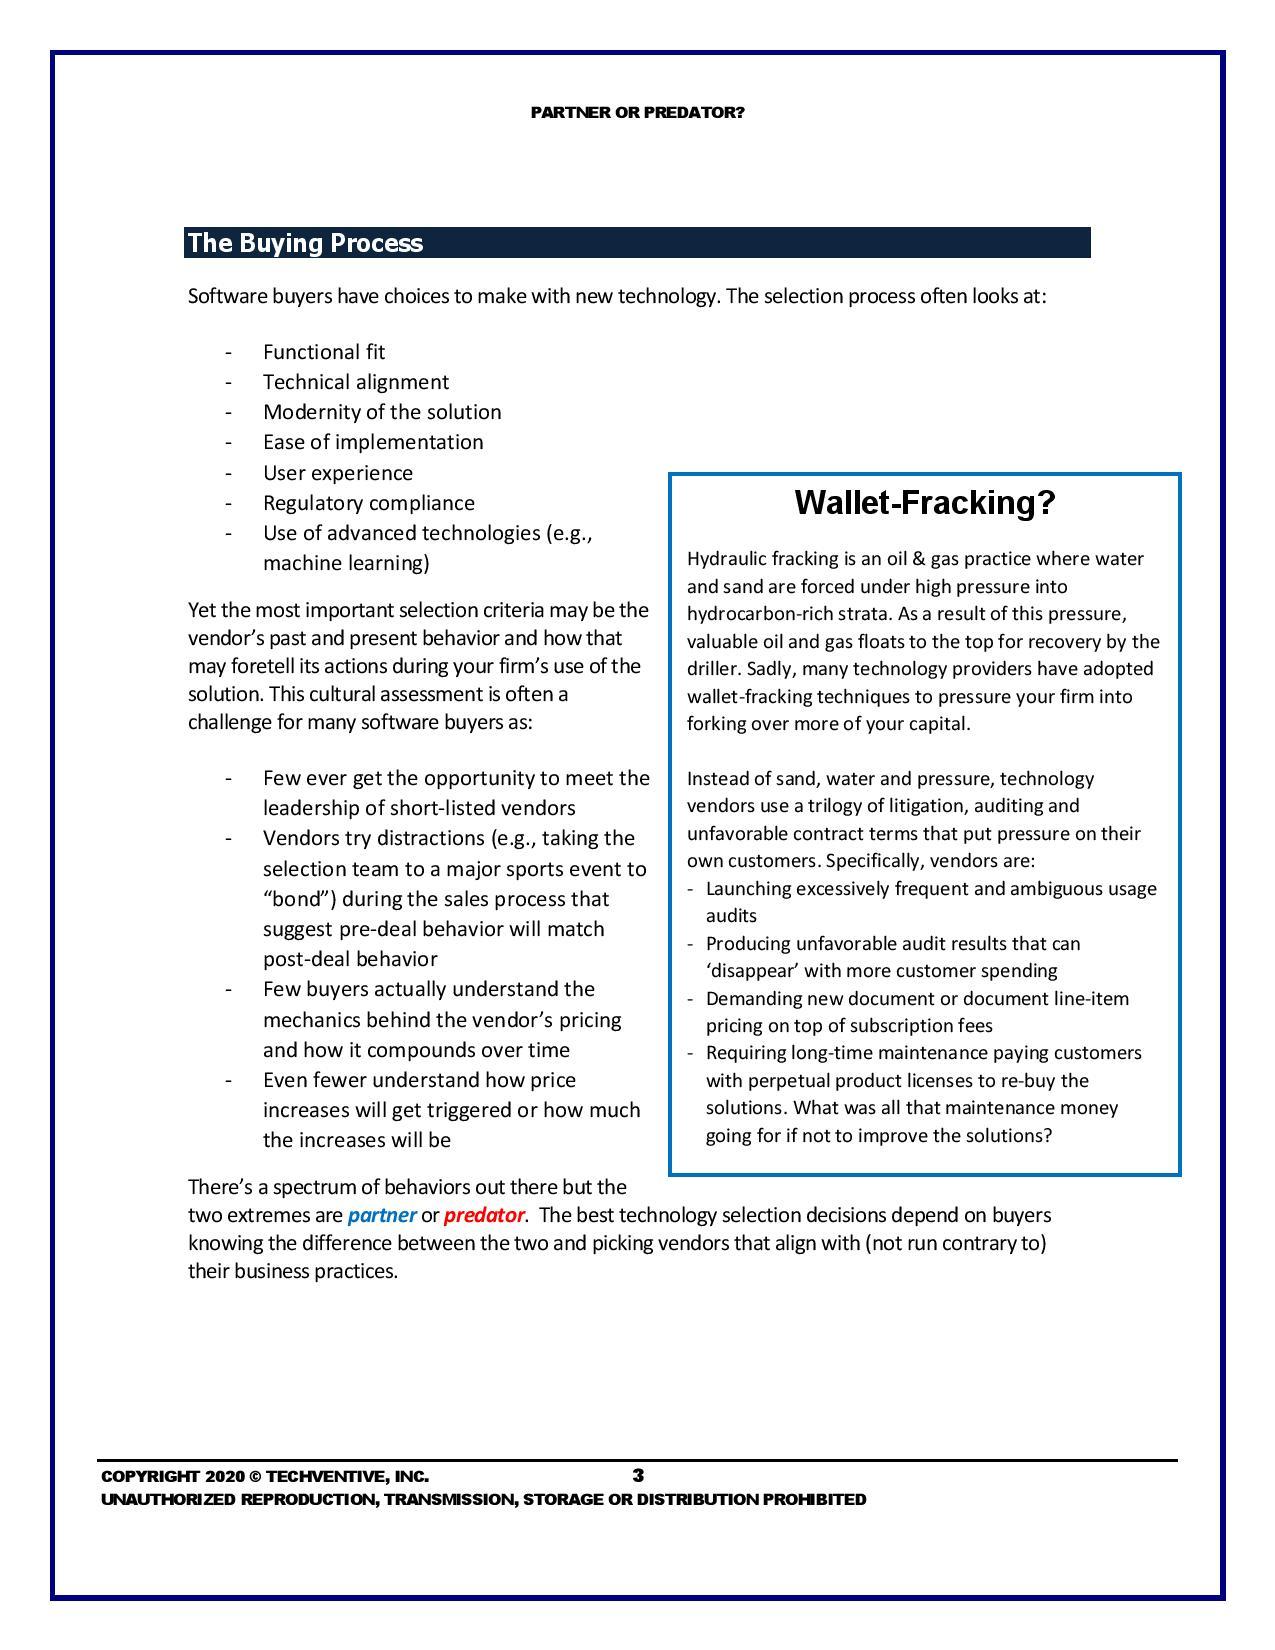 ERP Vendor Selection: Find a Partner, Not a Predator, page 2